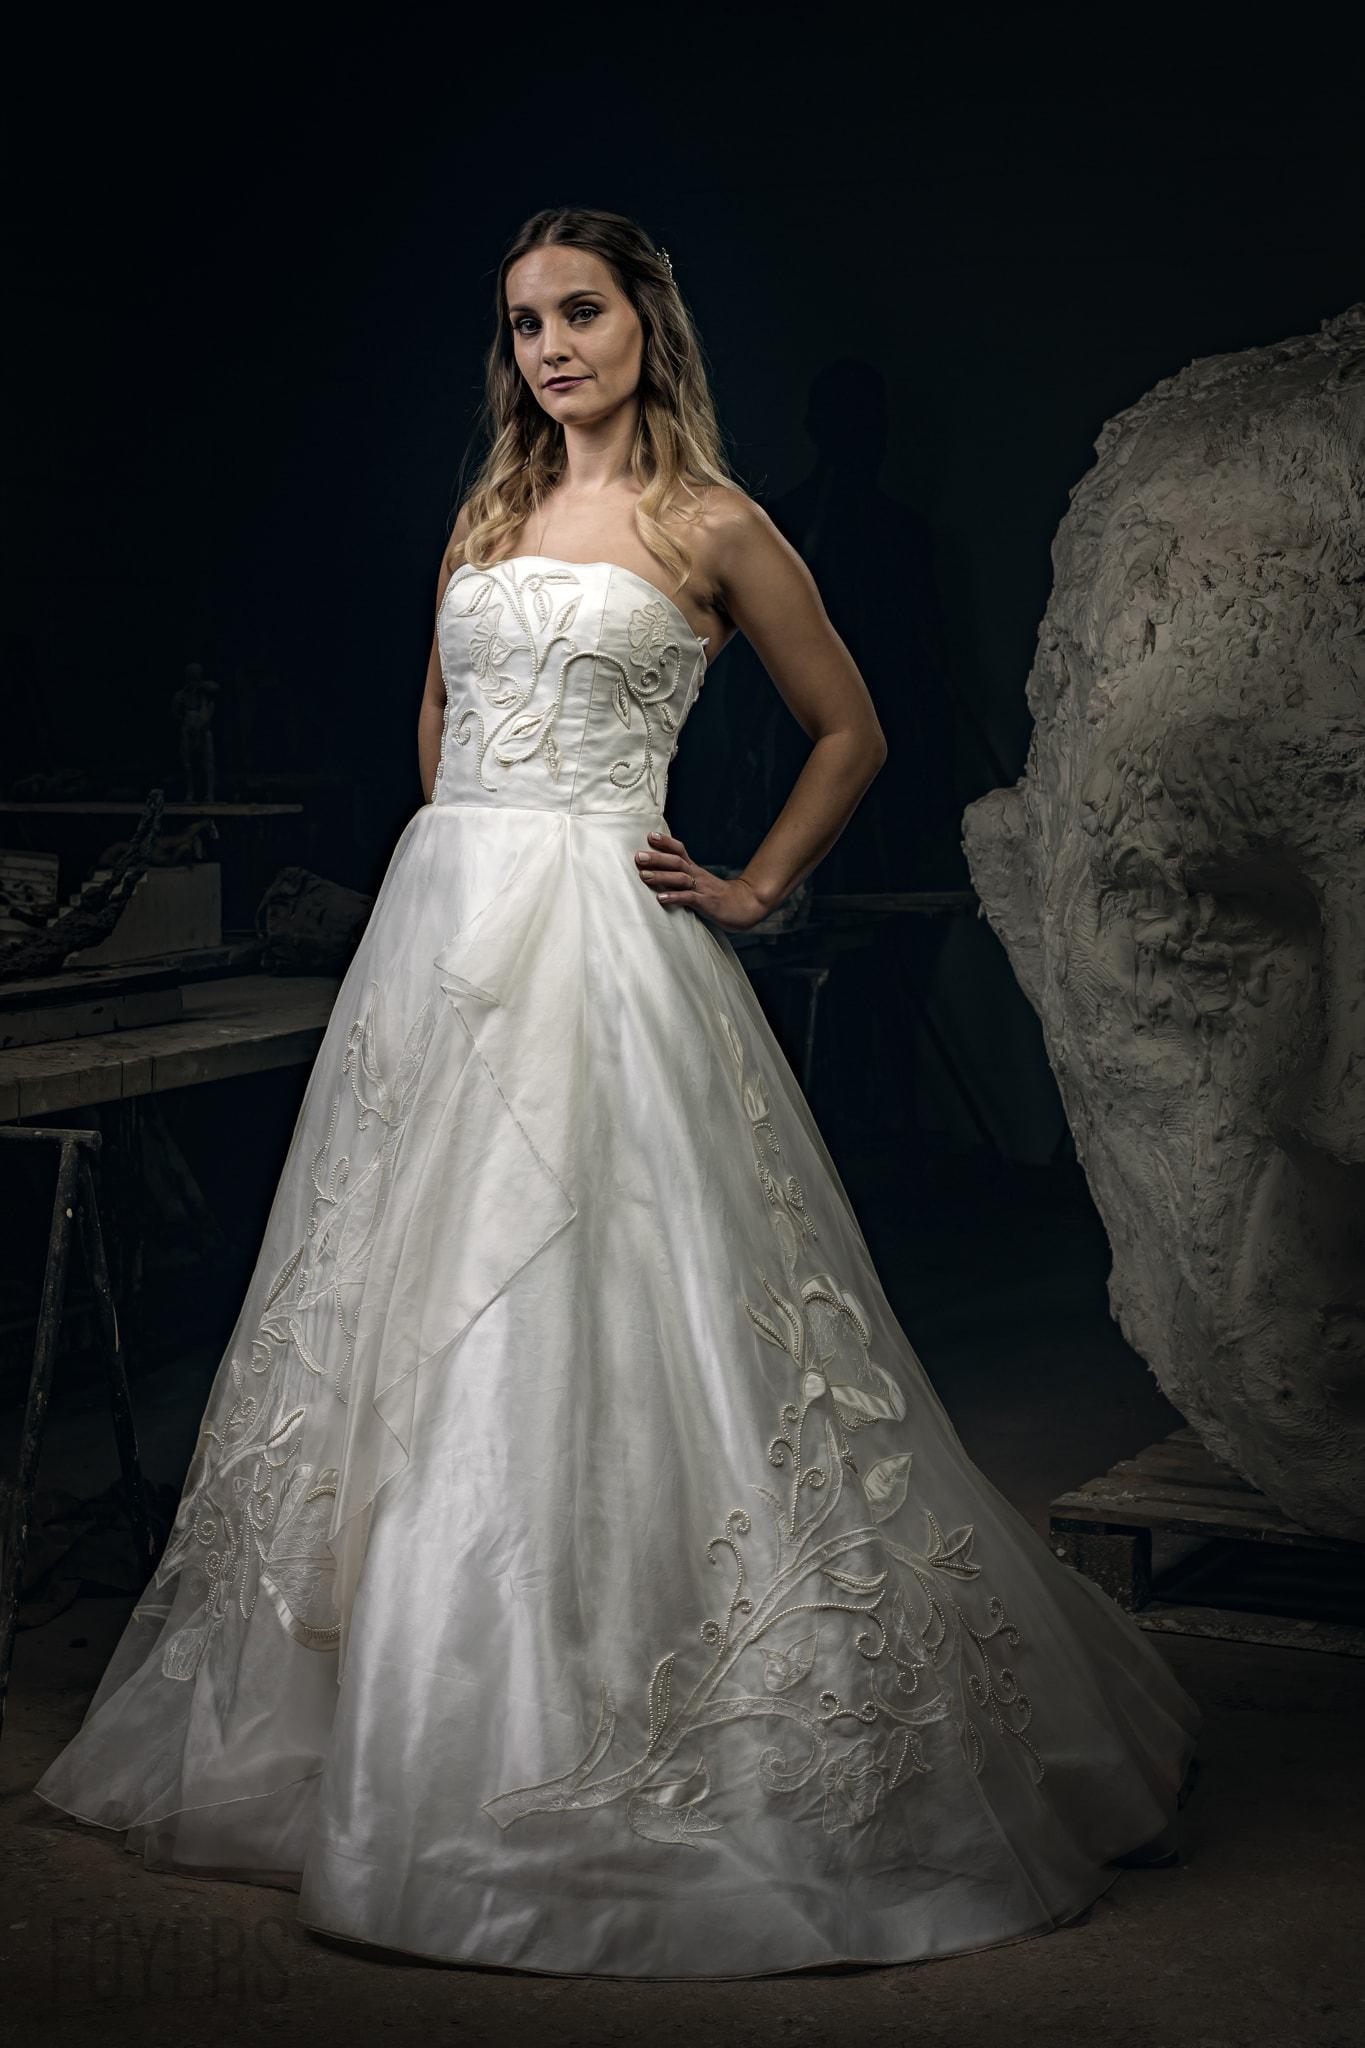 Silk organza dress with hand beading and appliqué Martin Dobson Luxury bridal wear designer